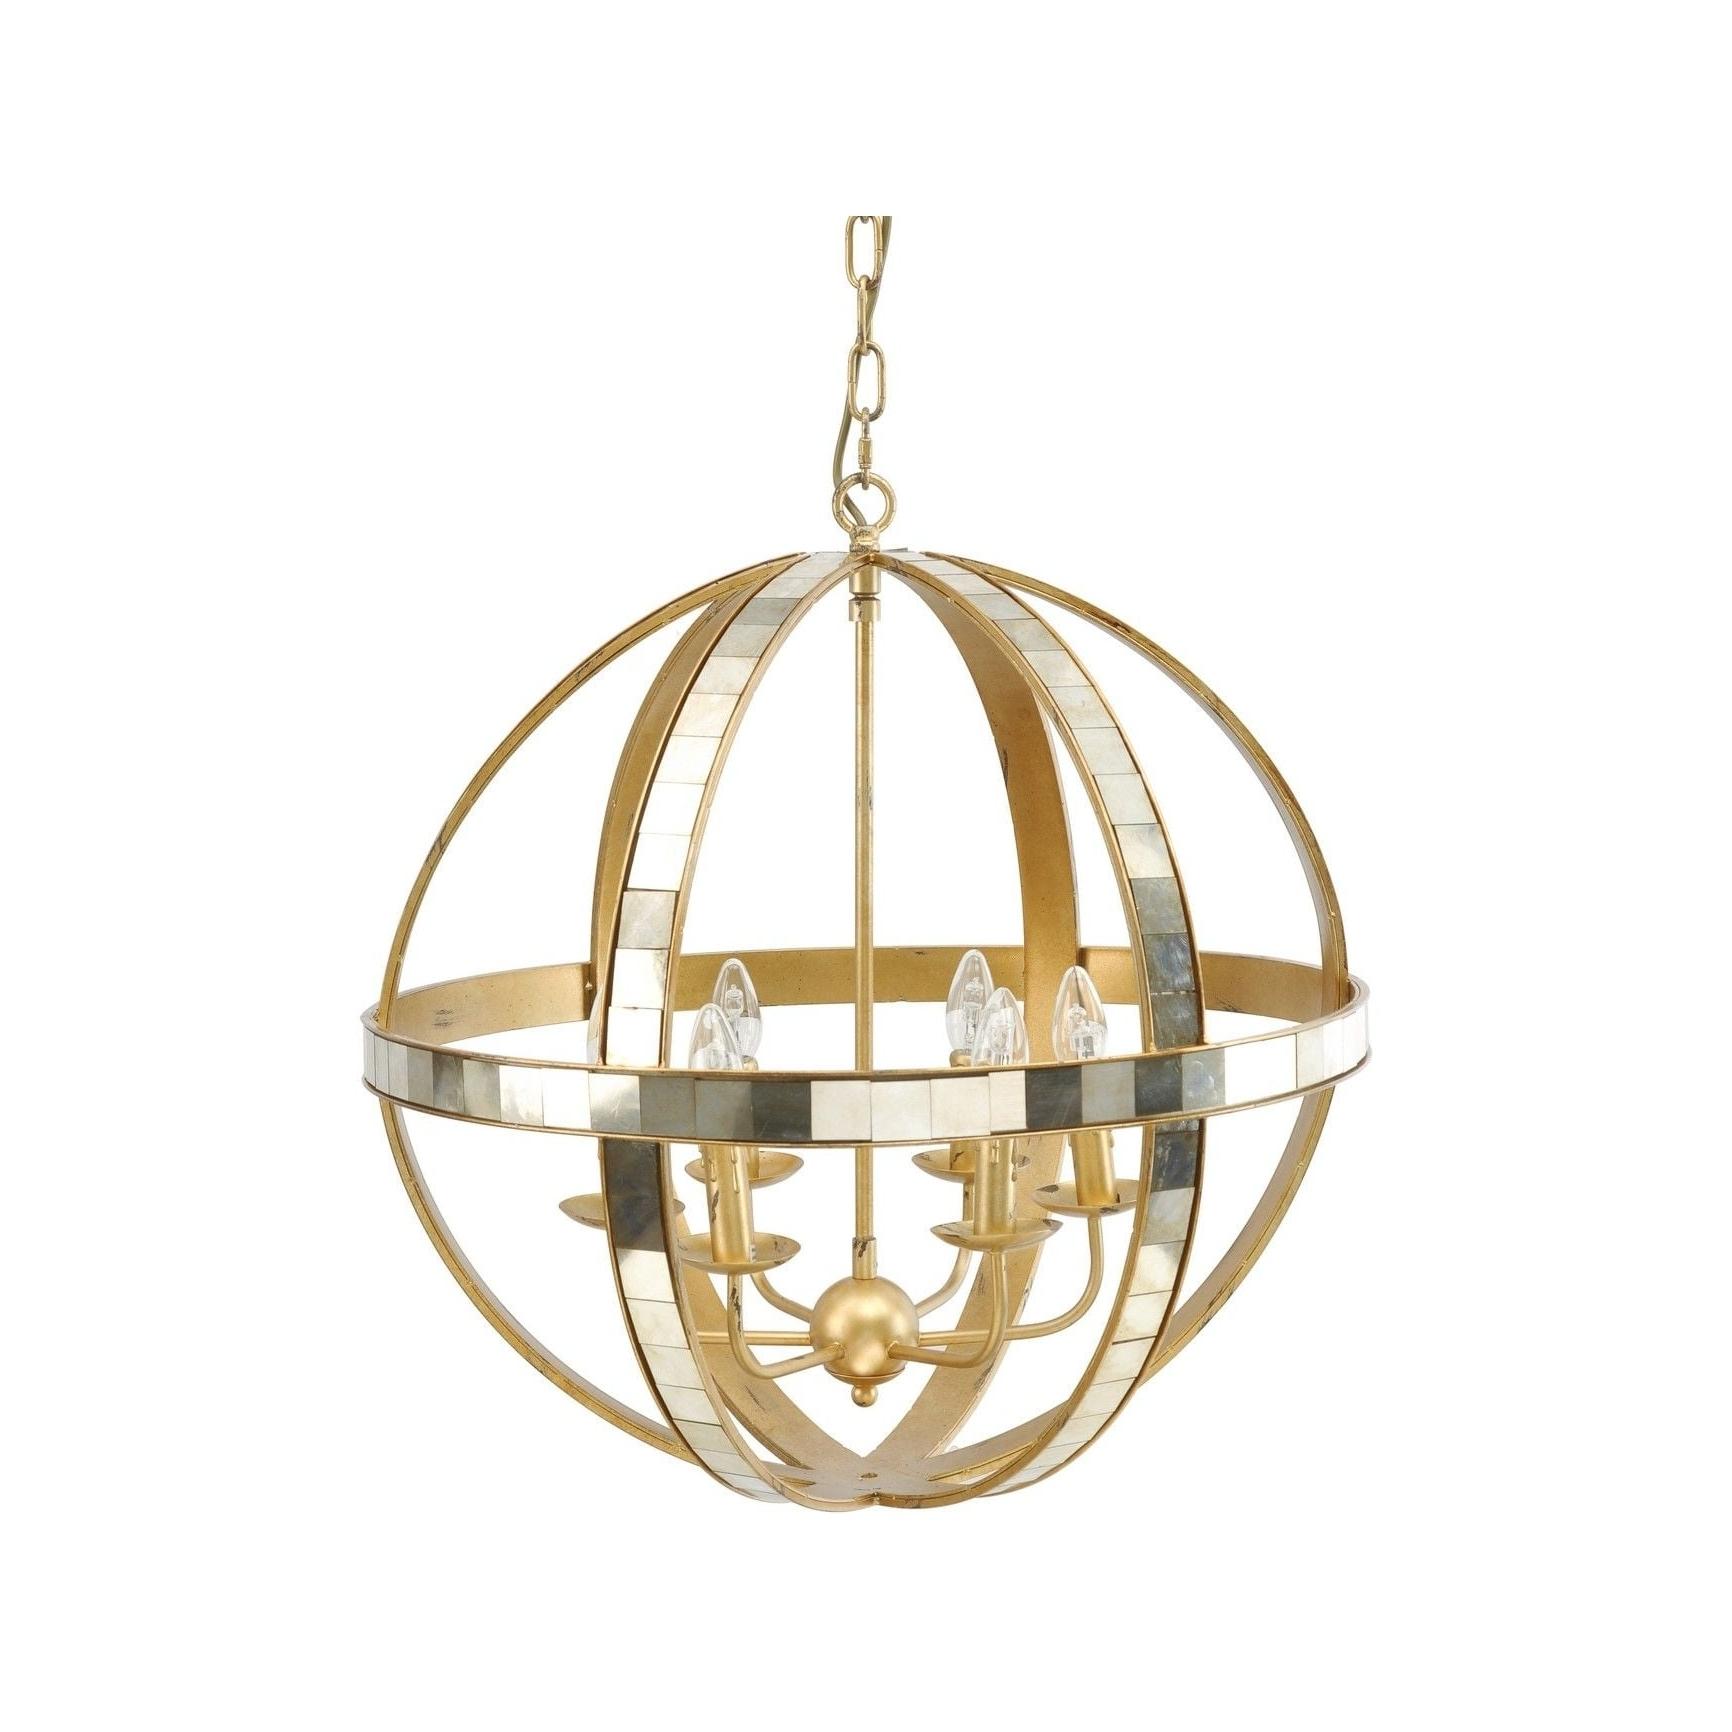 Cream Gold Chandelier With Regard To Latest Living Room : Gold Pendant Chandelier Gold Sputnik Chandelier Gold (View 19 of 20)